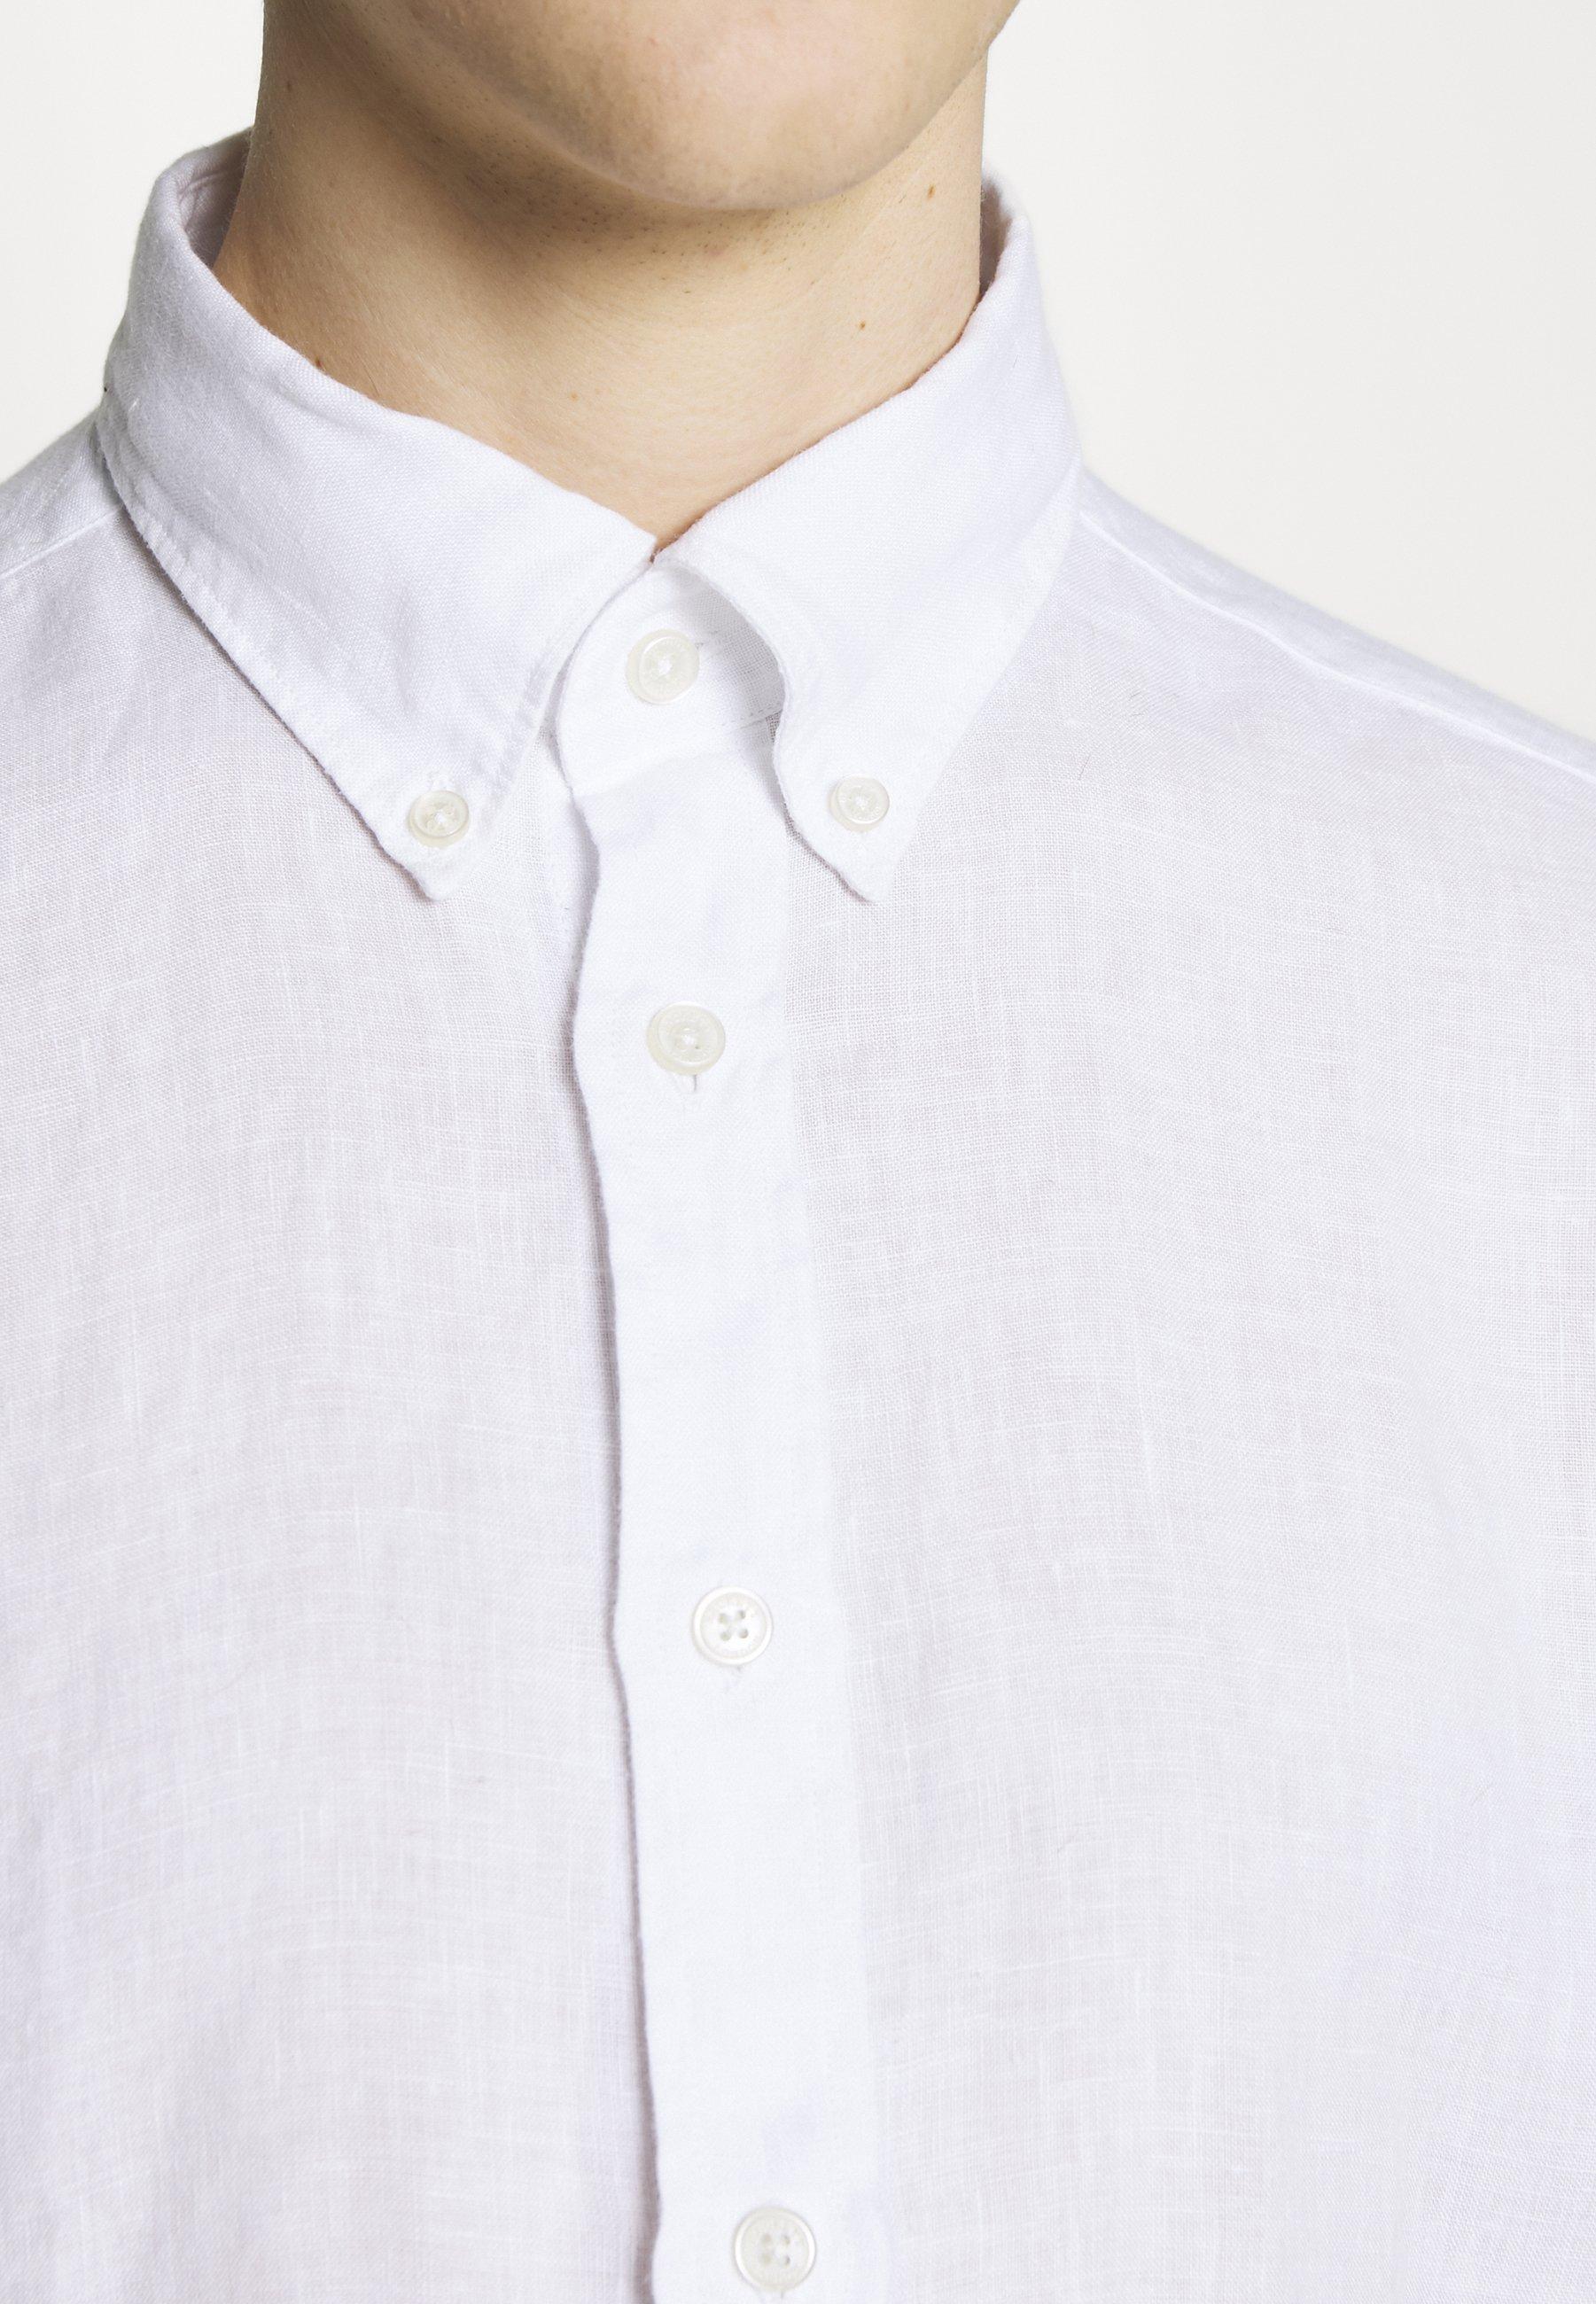 Hackett London Garment Dye Slim Fit - Skjorta Optic White